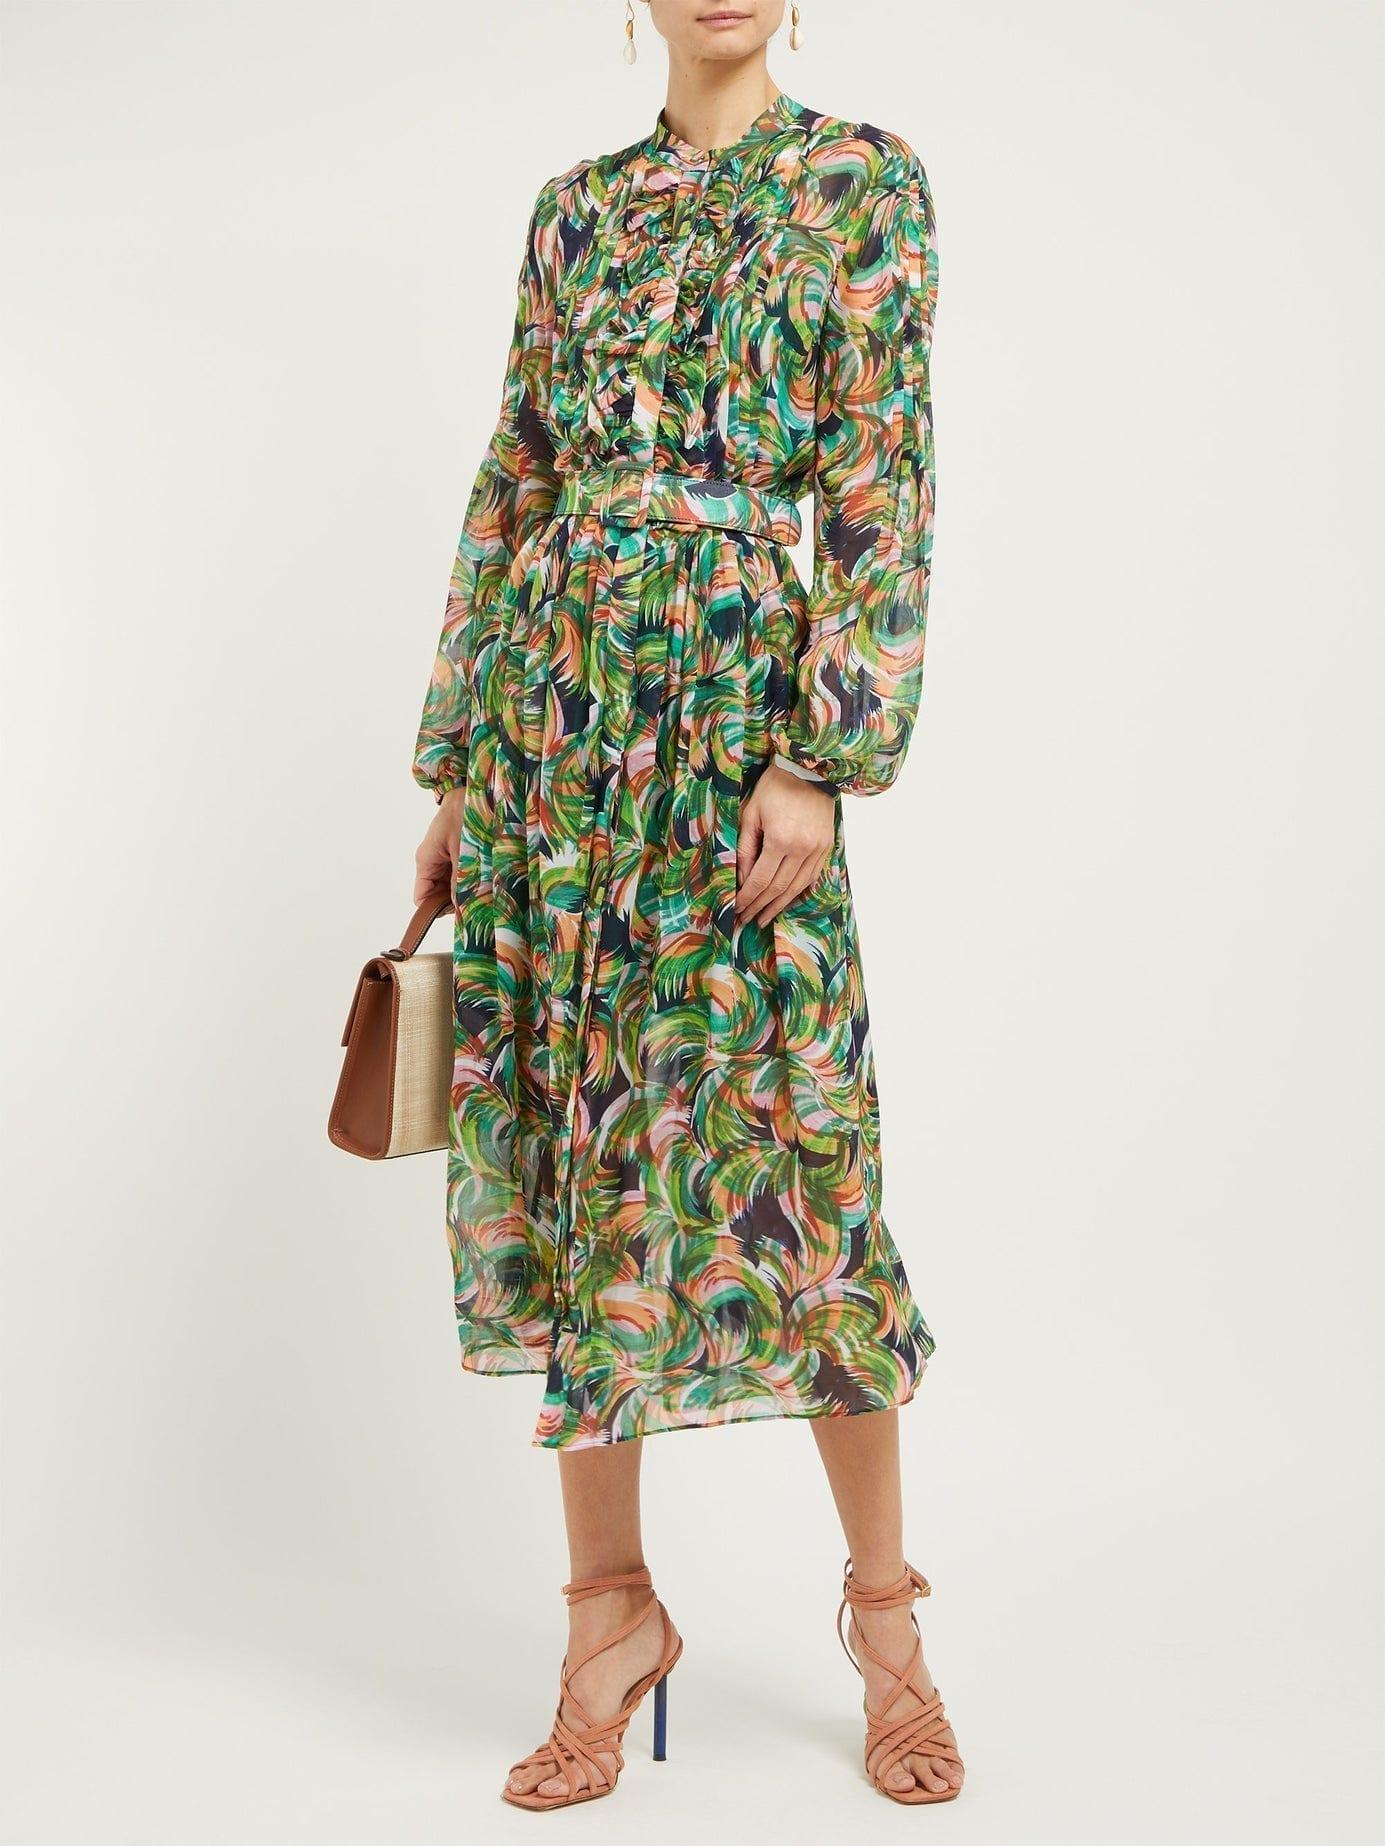 4e90d7359 SALONI Raquel Printed Silk Crepe De Chine Dress - We Select Dresses